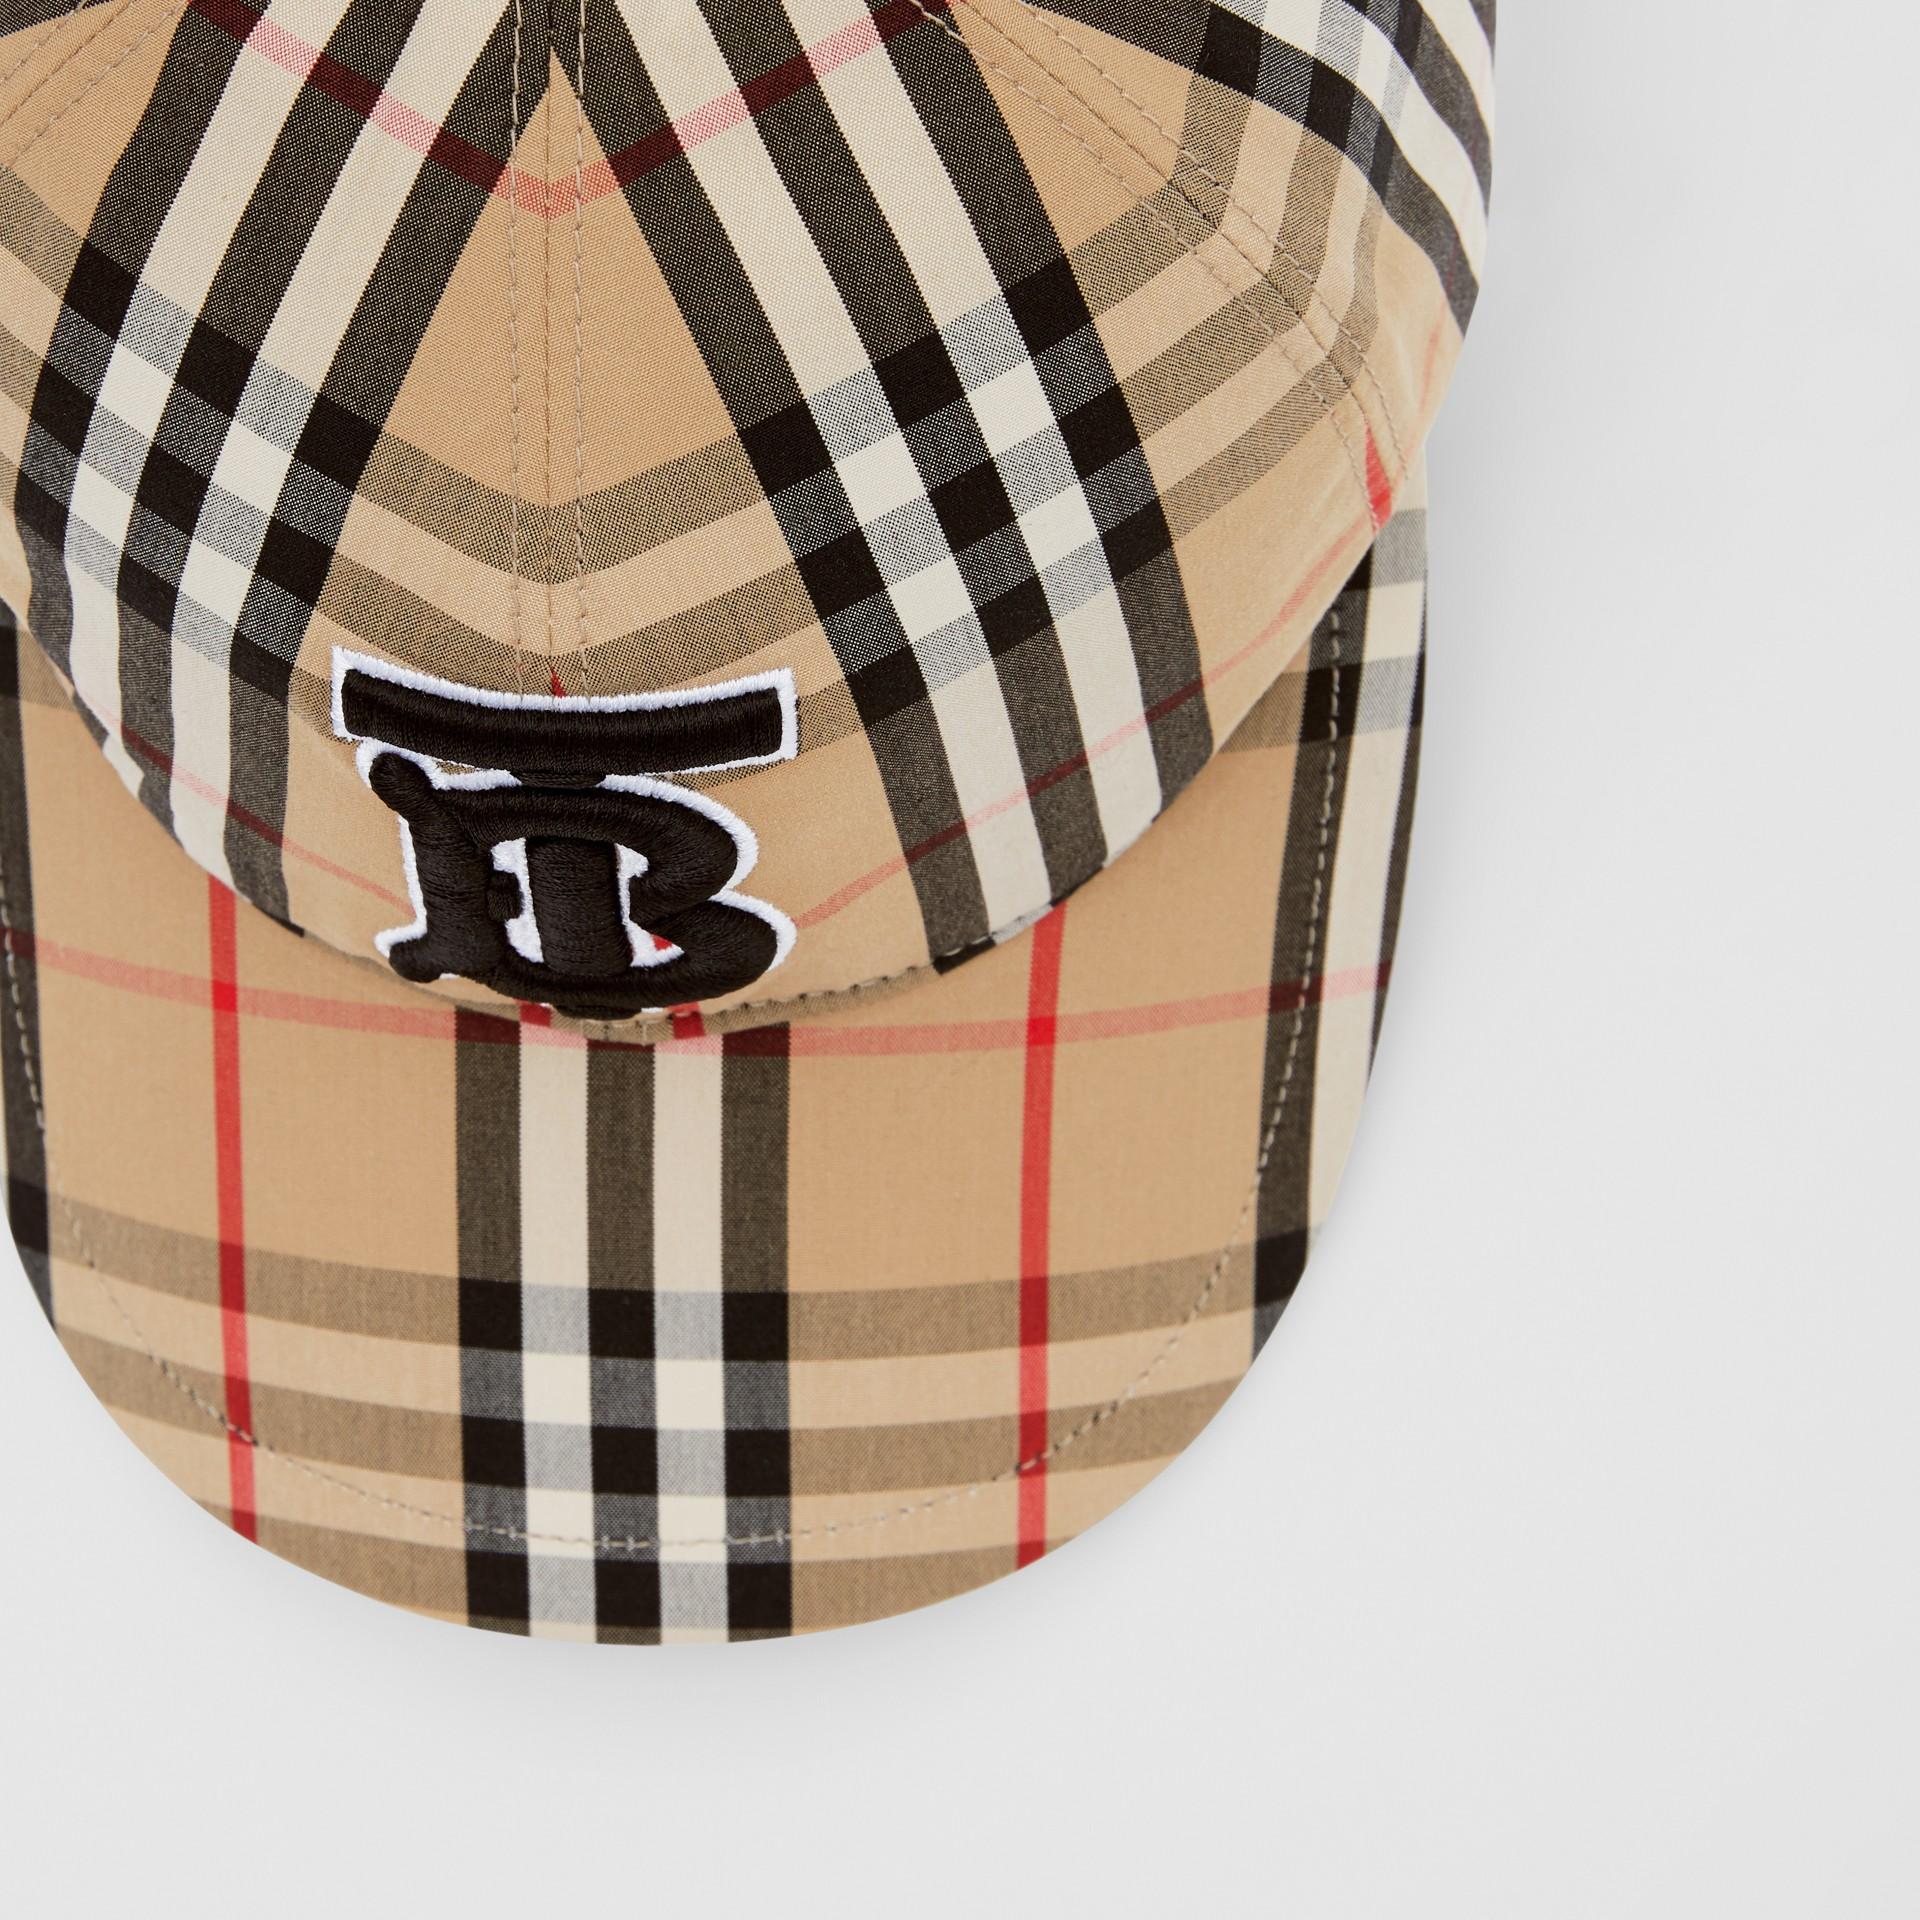 Monogram Motif Vintage Check Cotton Baseball Cap in Archive Beige | Burberry United Kingdom - gallery image 1